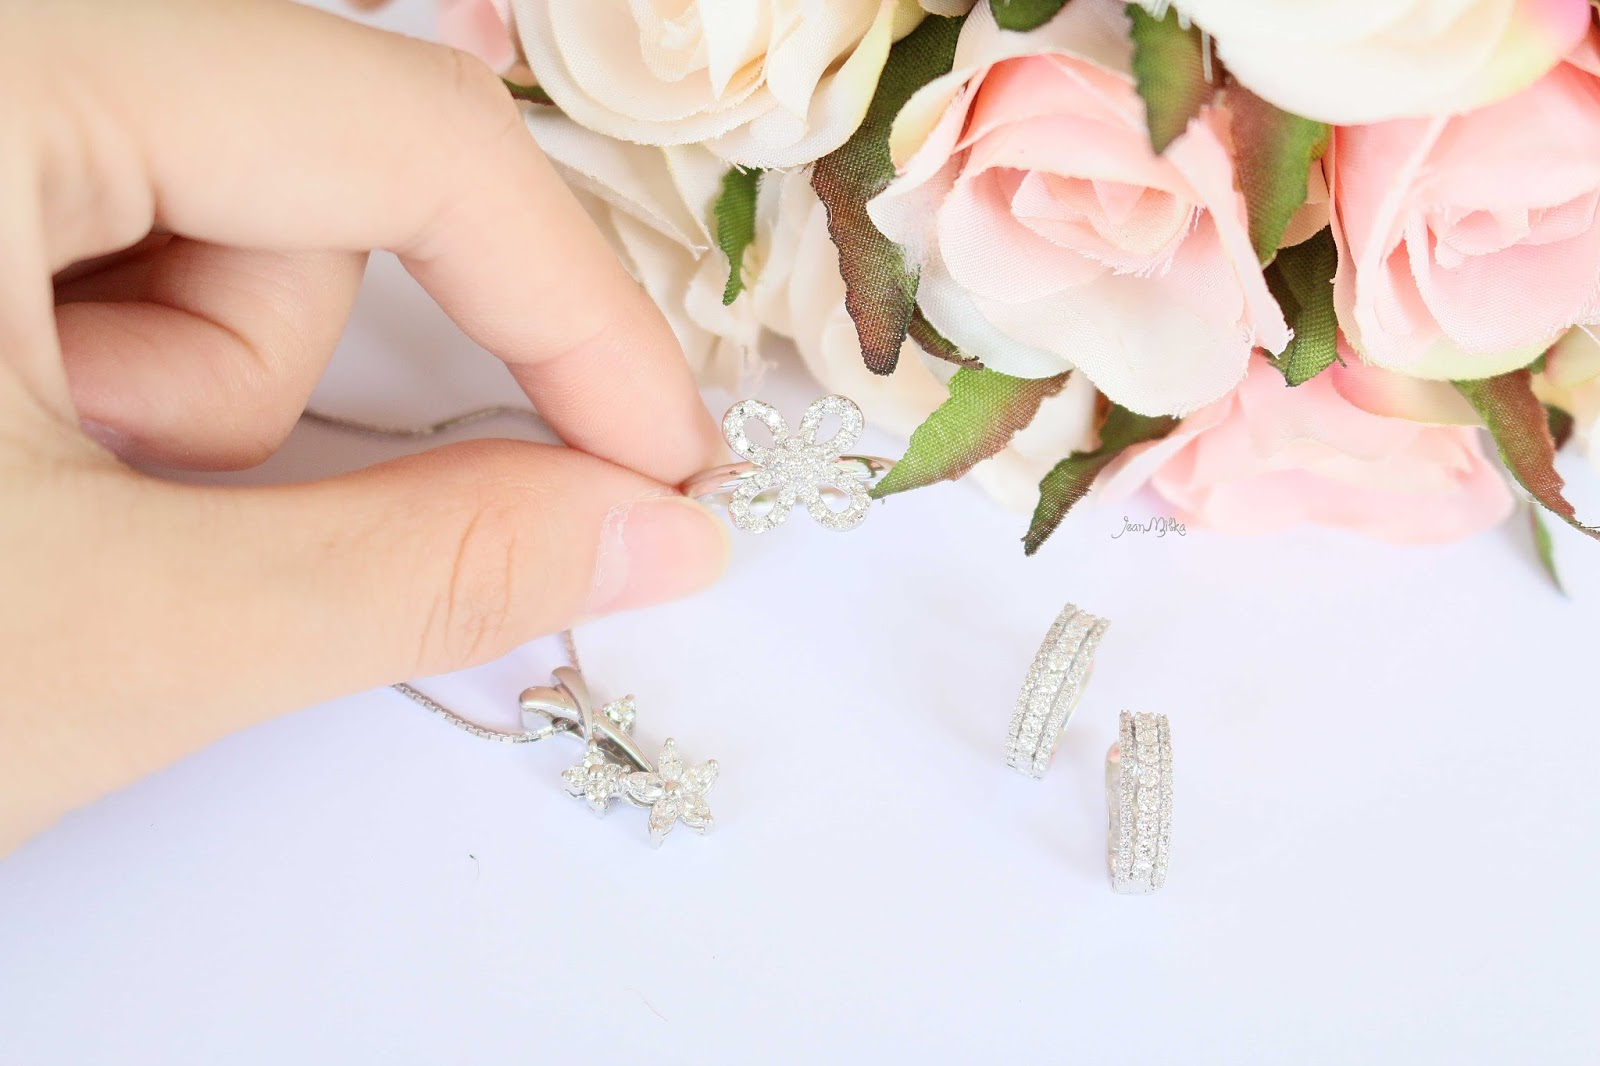 orori, orori jewelry, diamond, reivew, online shop, indonesia, jakarta